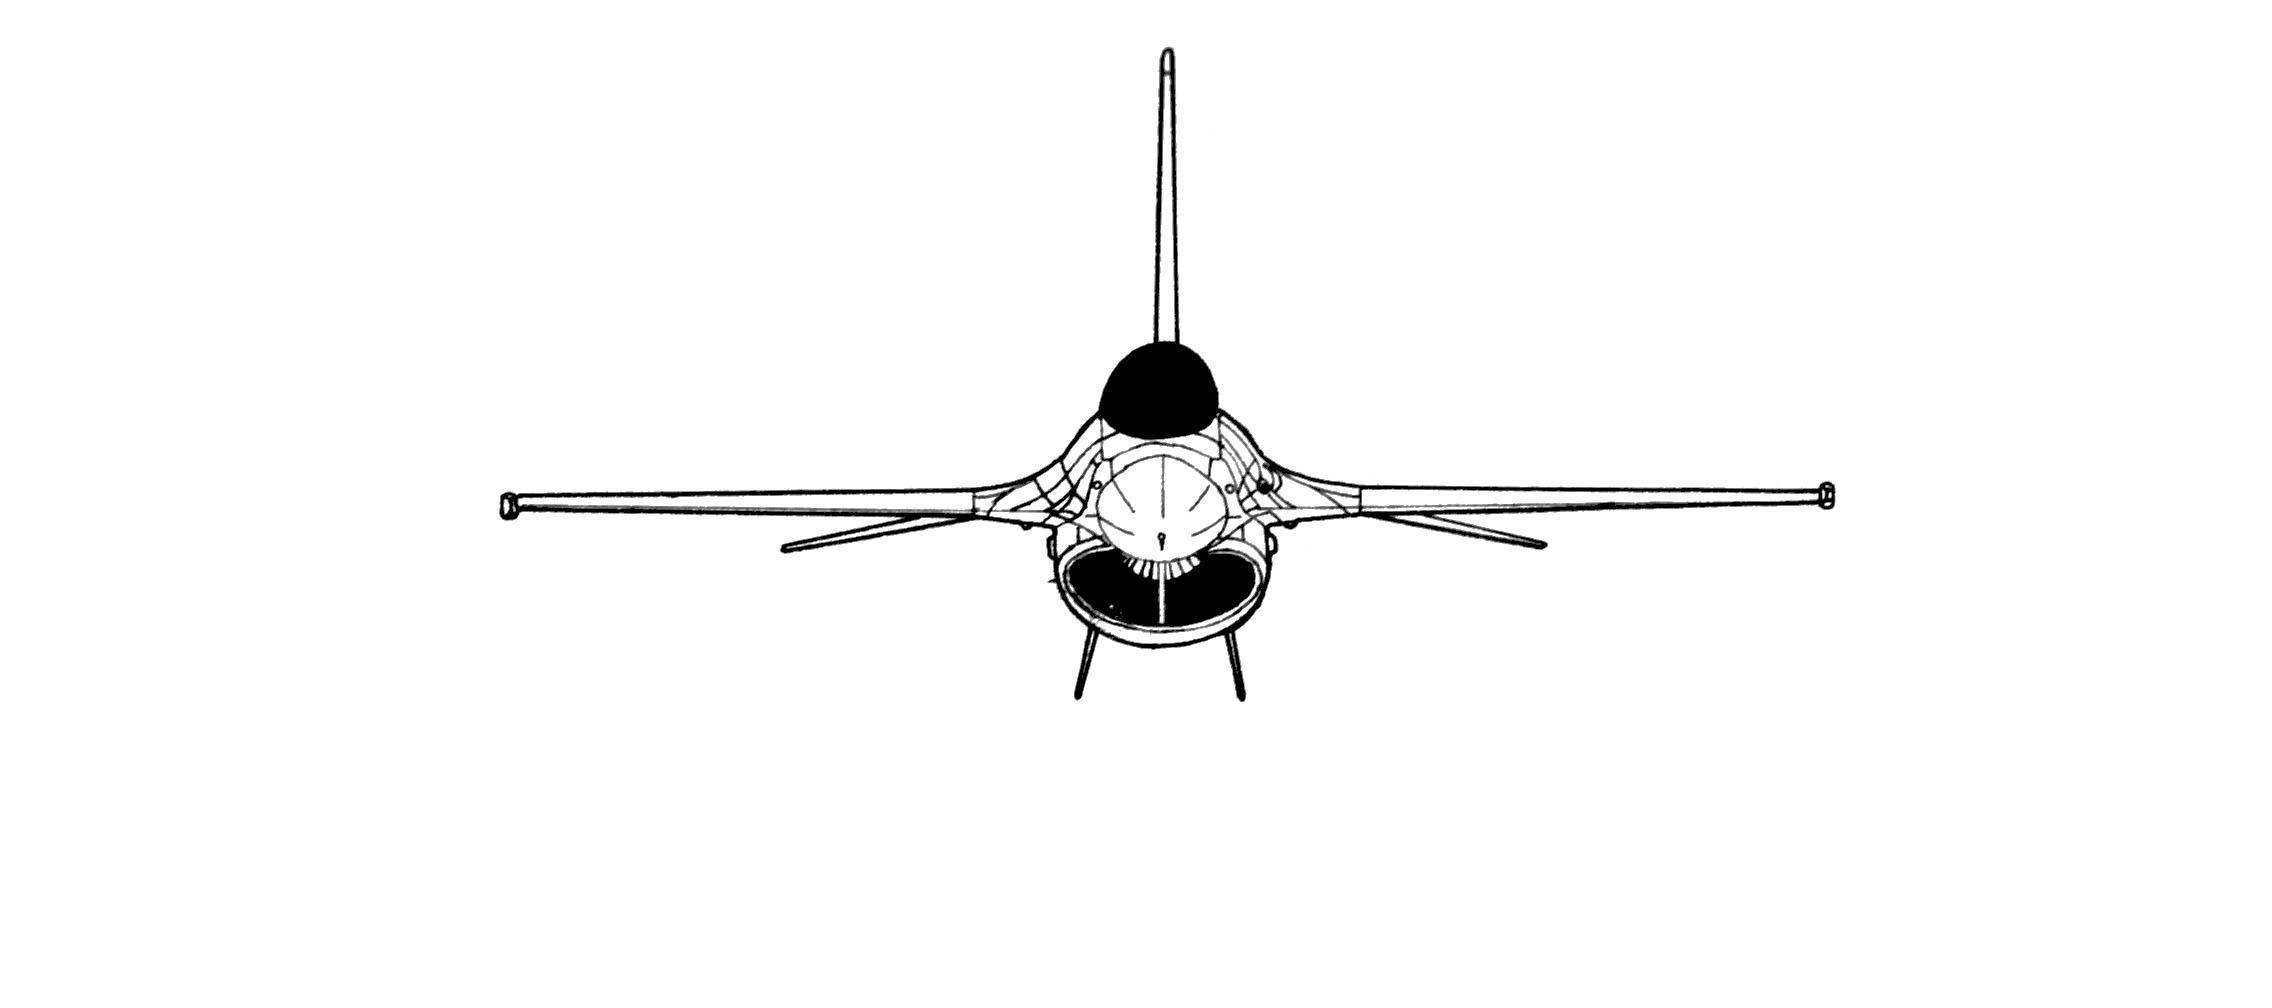 F 16 Fighting Falcon Blueprint